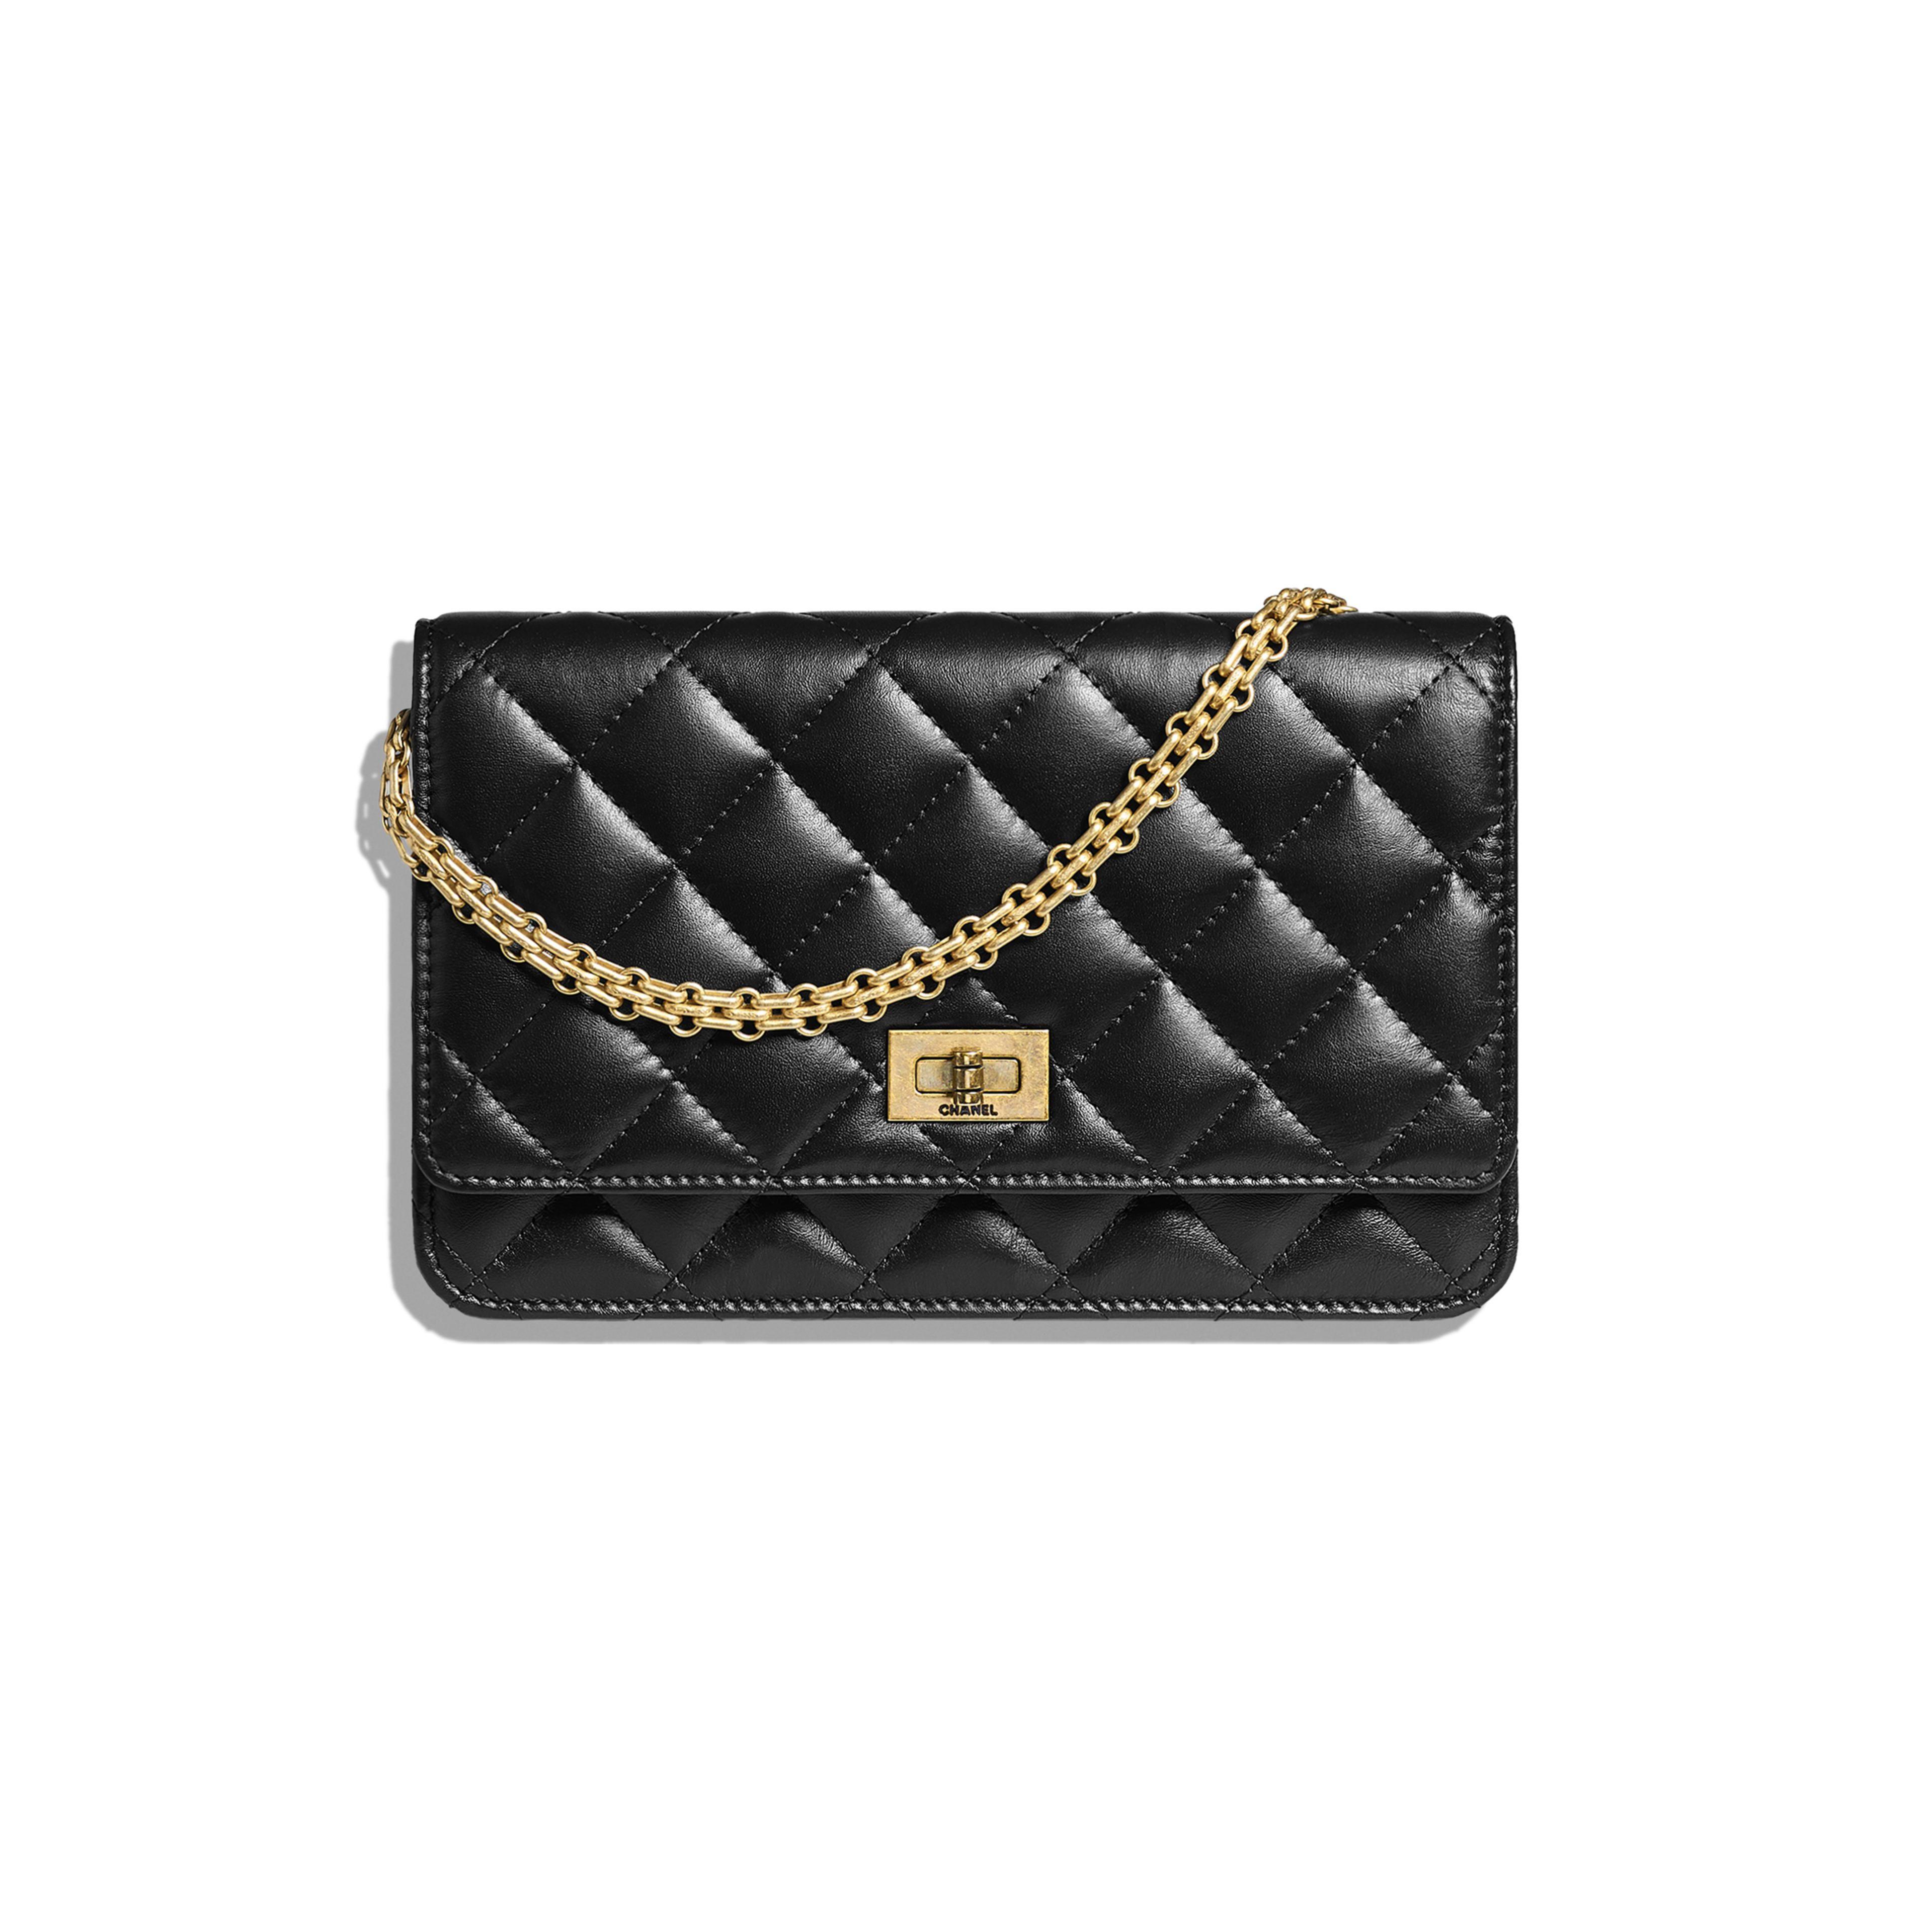 de02b9a940 2.55 Wallet on Chain - Black - Aged Calfskin   Gold-Tone Metal - Default